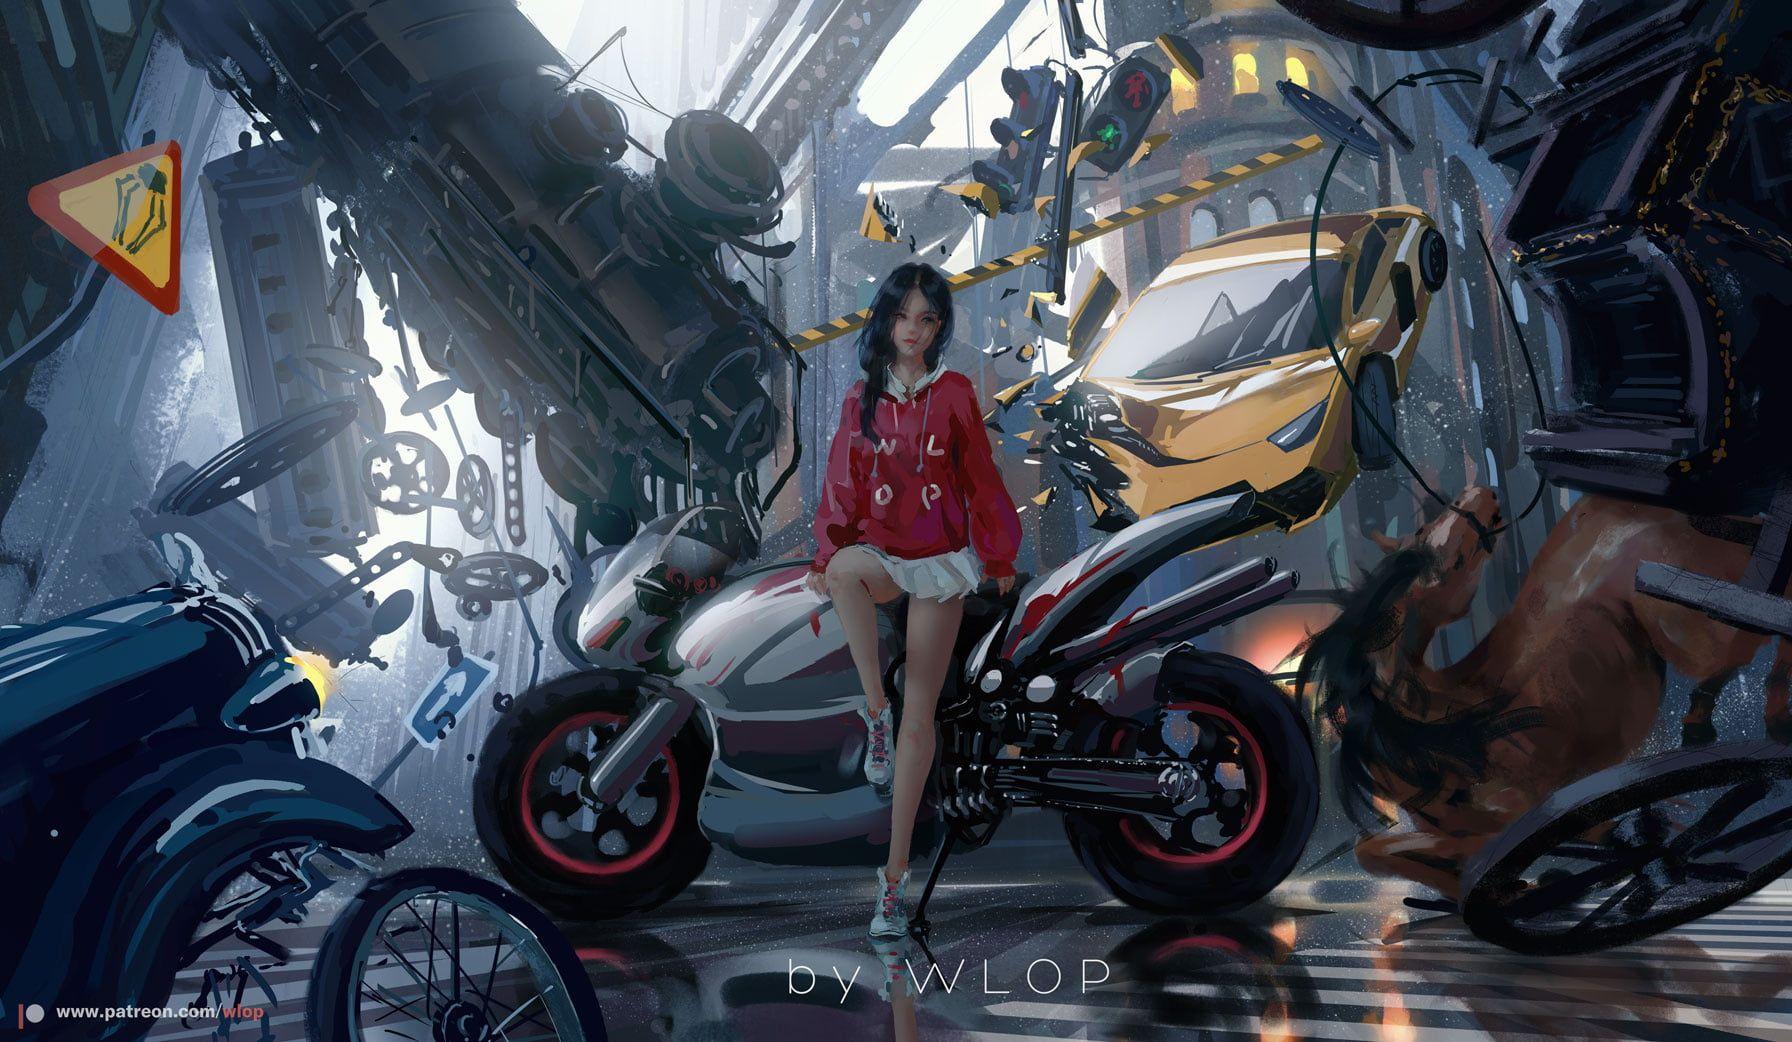 Civilization Motorcycle Digital Digital Prints Wlop 720p